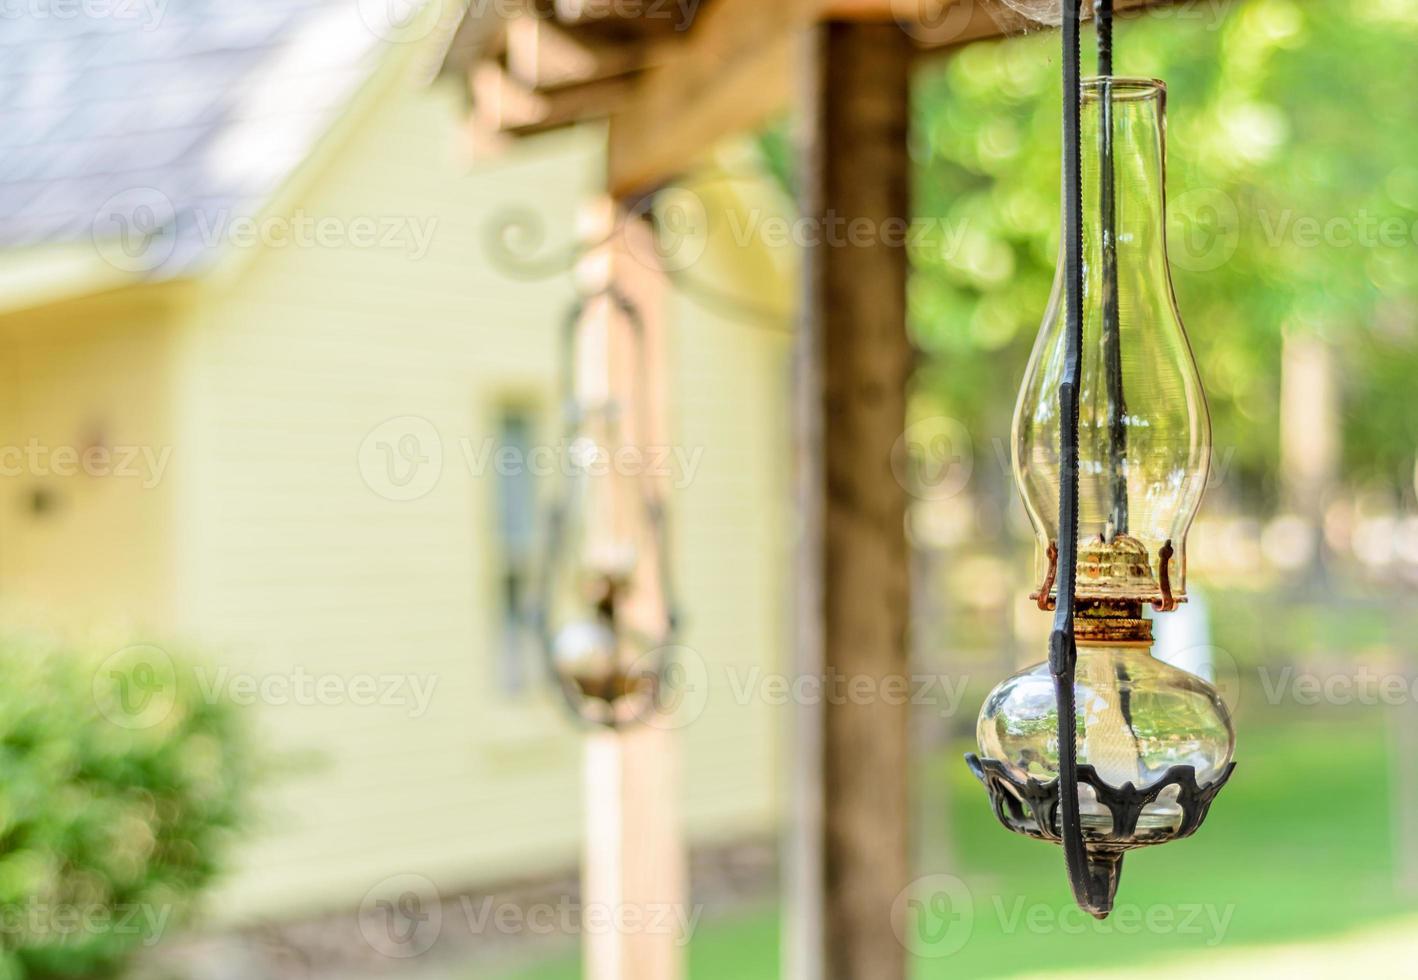 olielamp in de veranda foto